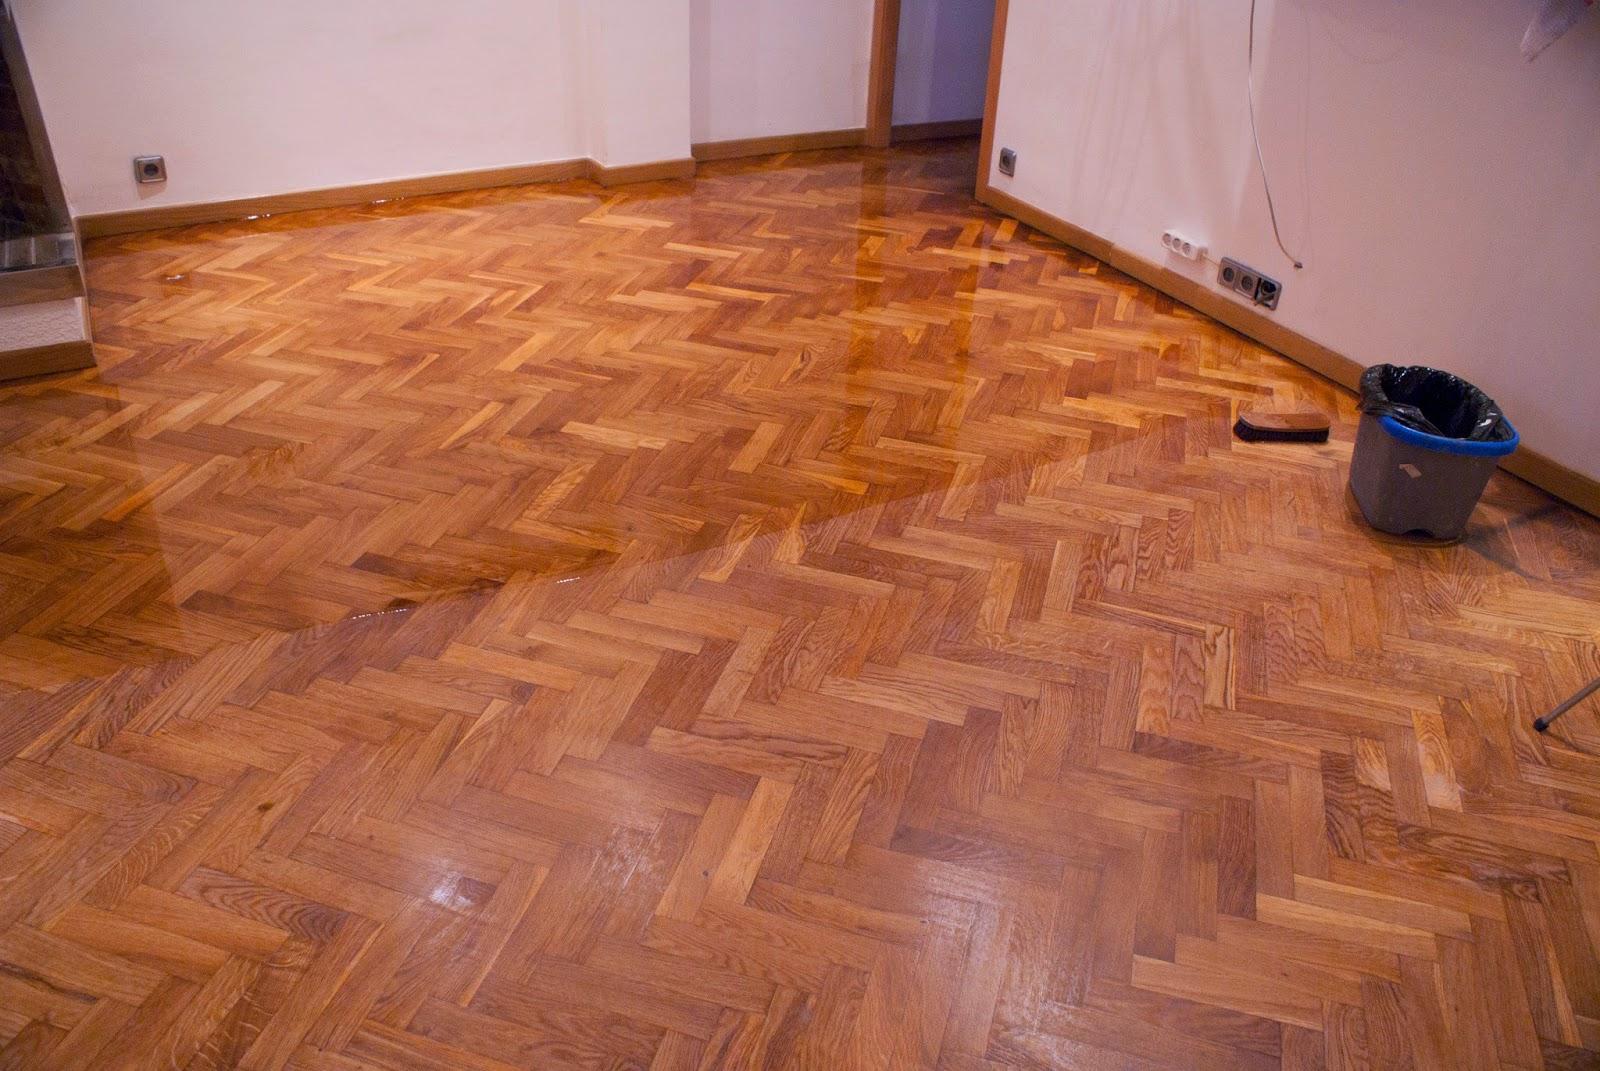 Restaurar acuchillar o pulir el parquet - Reparar piso parquet ...